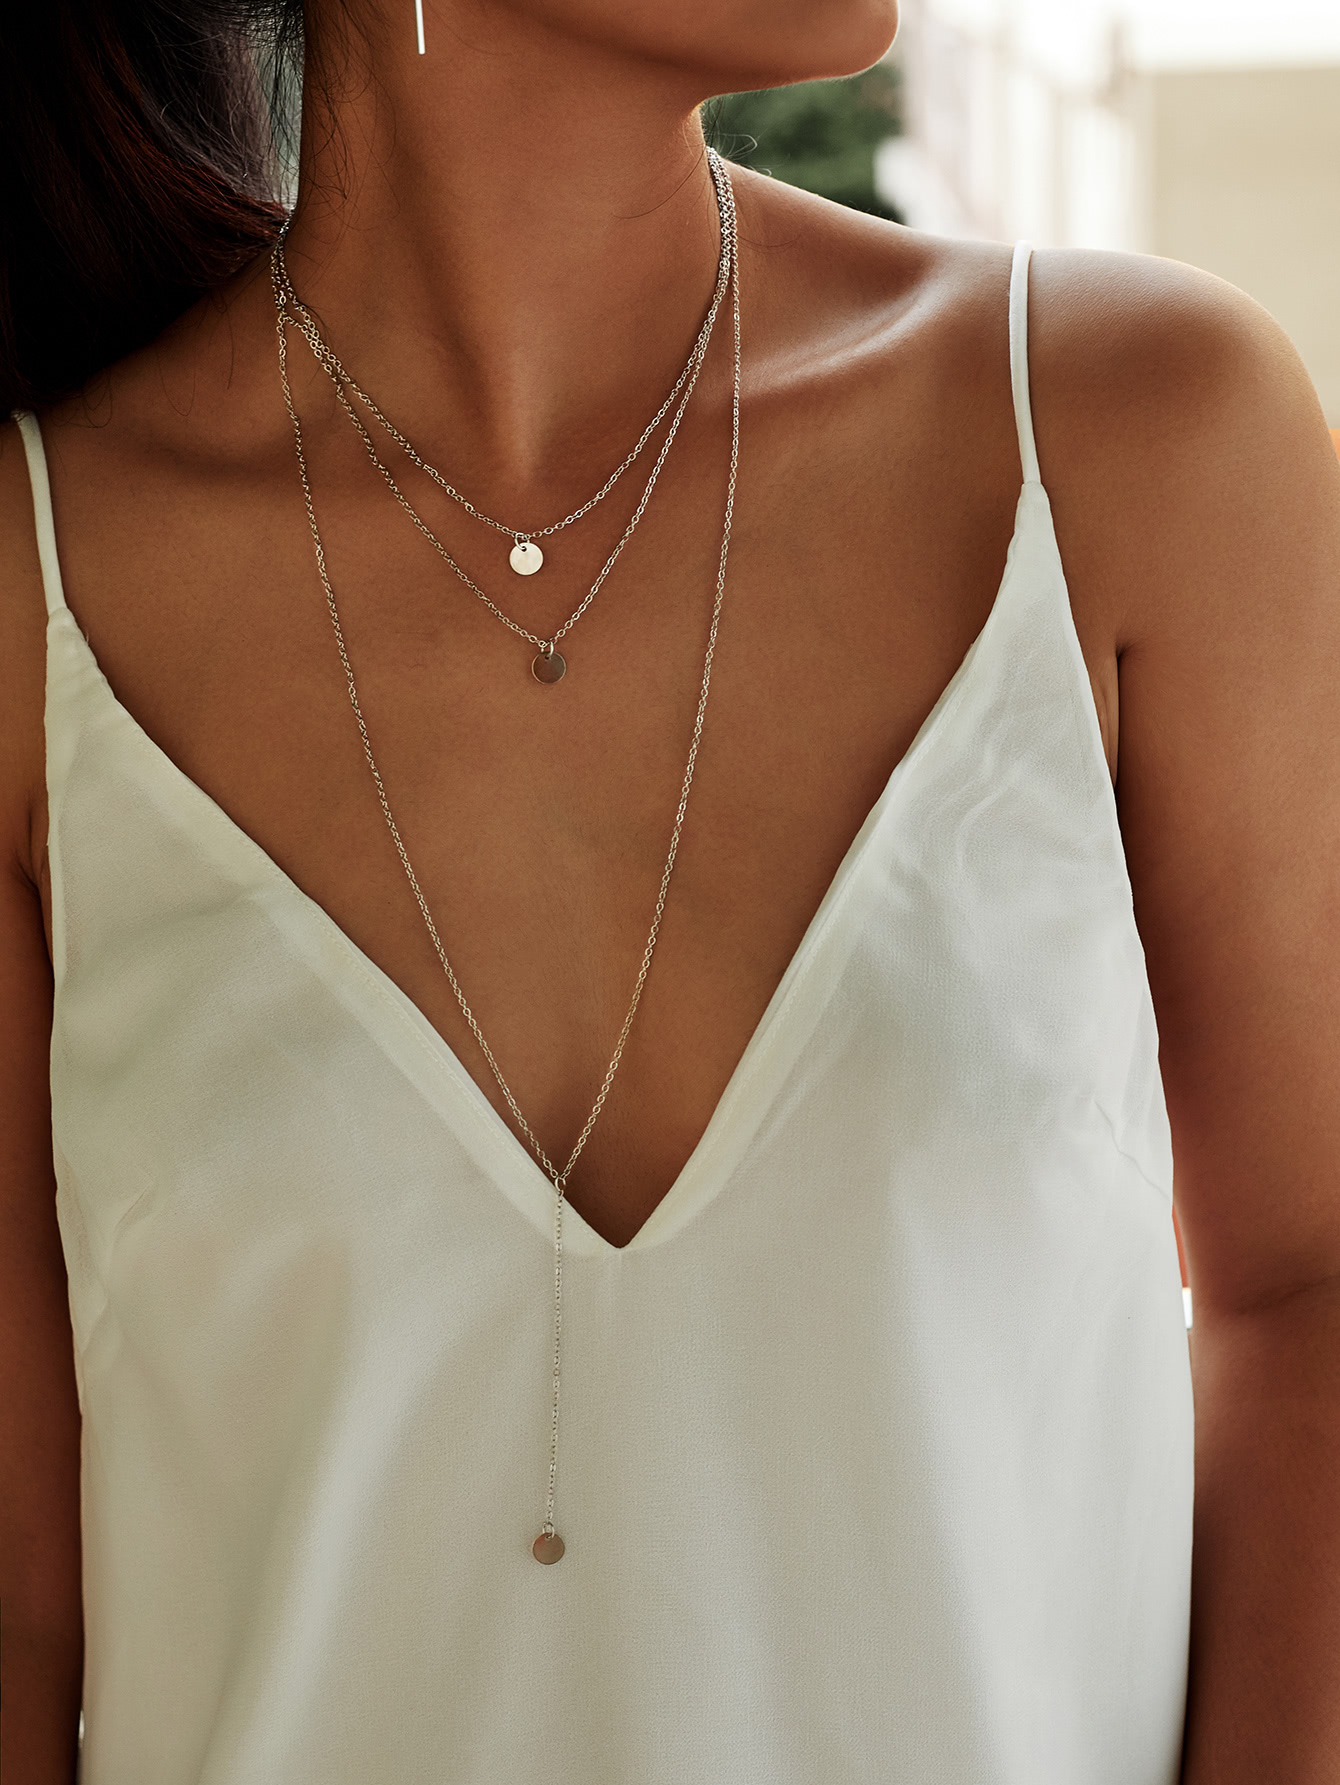 Sequin Pendant Design Chain Necklace Set sequin overlay triangle design necklace